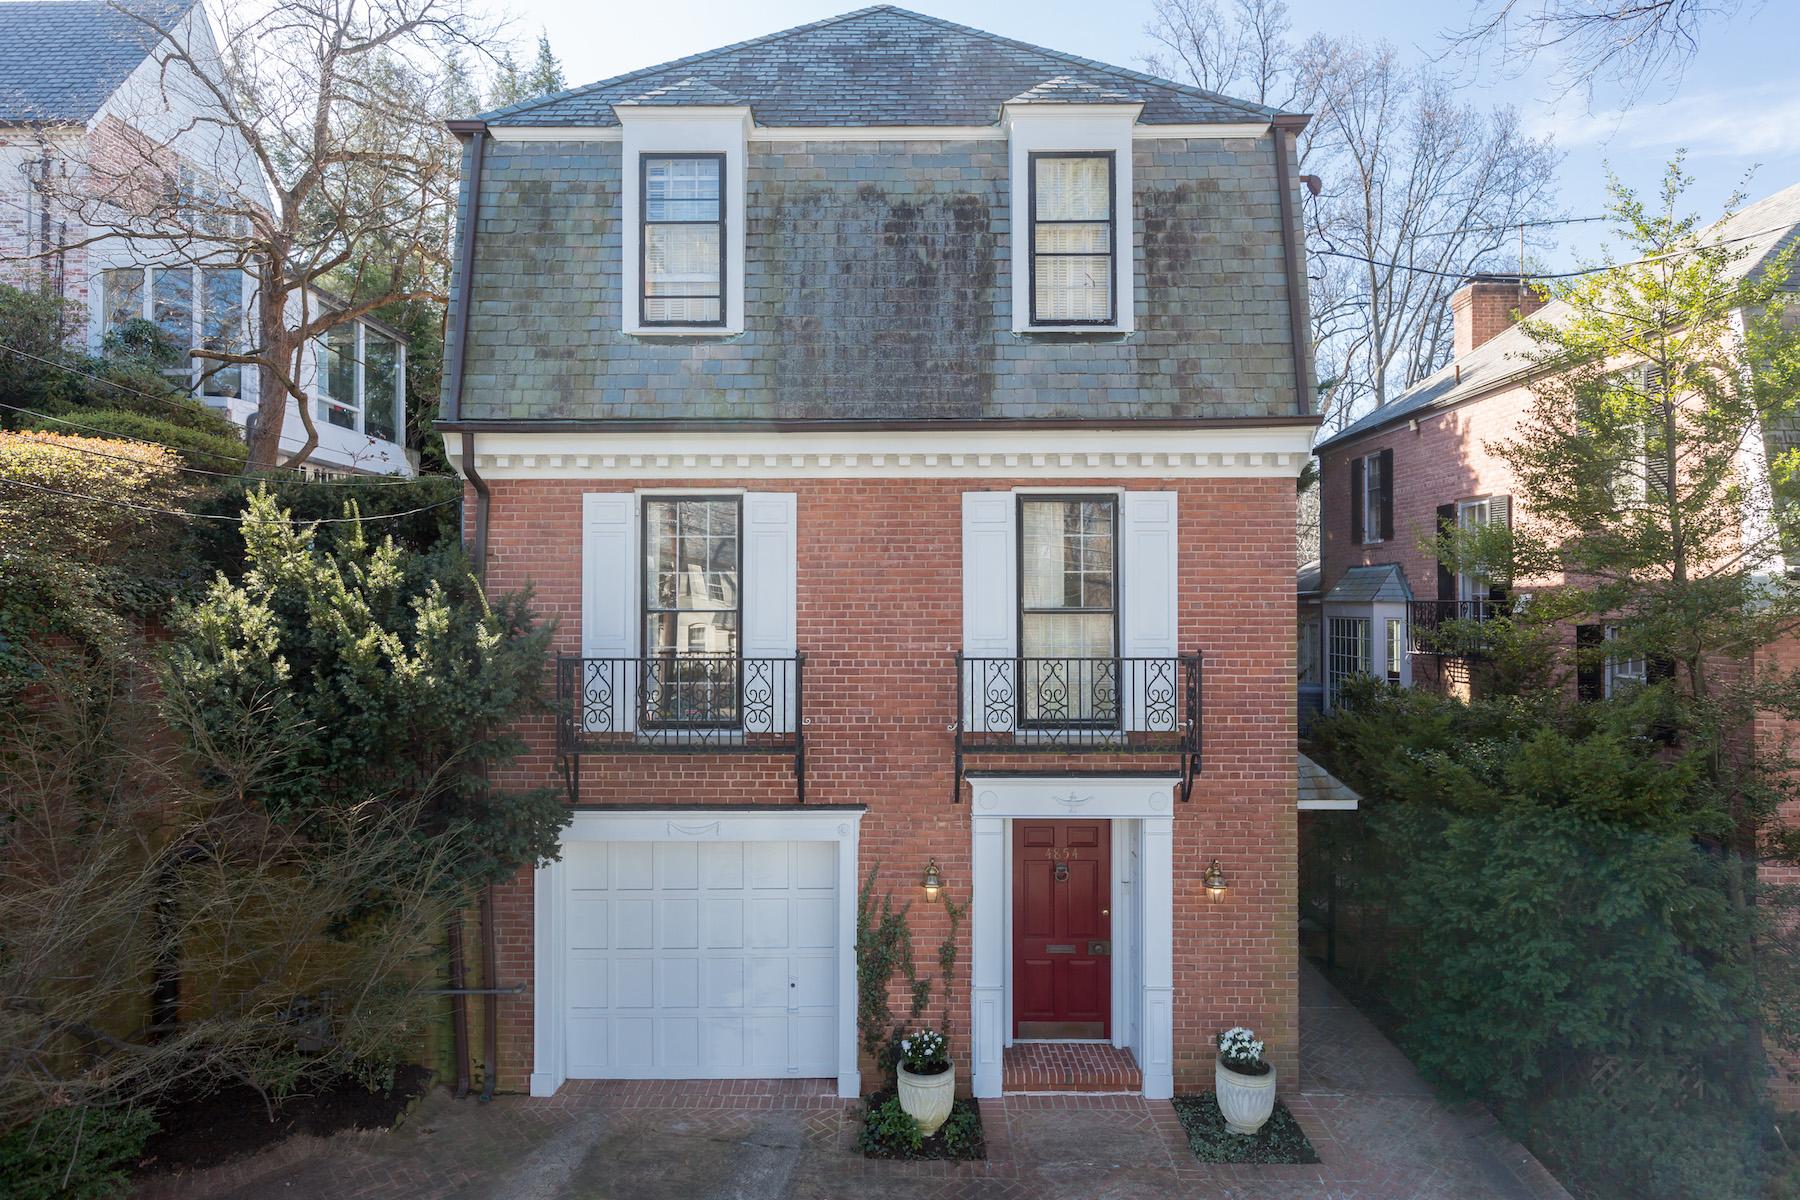 Casa para uma família para Venda às Kent 4854 Loughboro Rd Washington, Distrito De Columbia, 20016 Estados Unidos